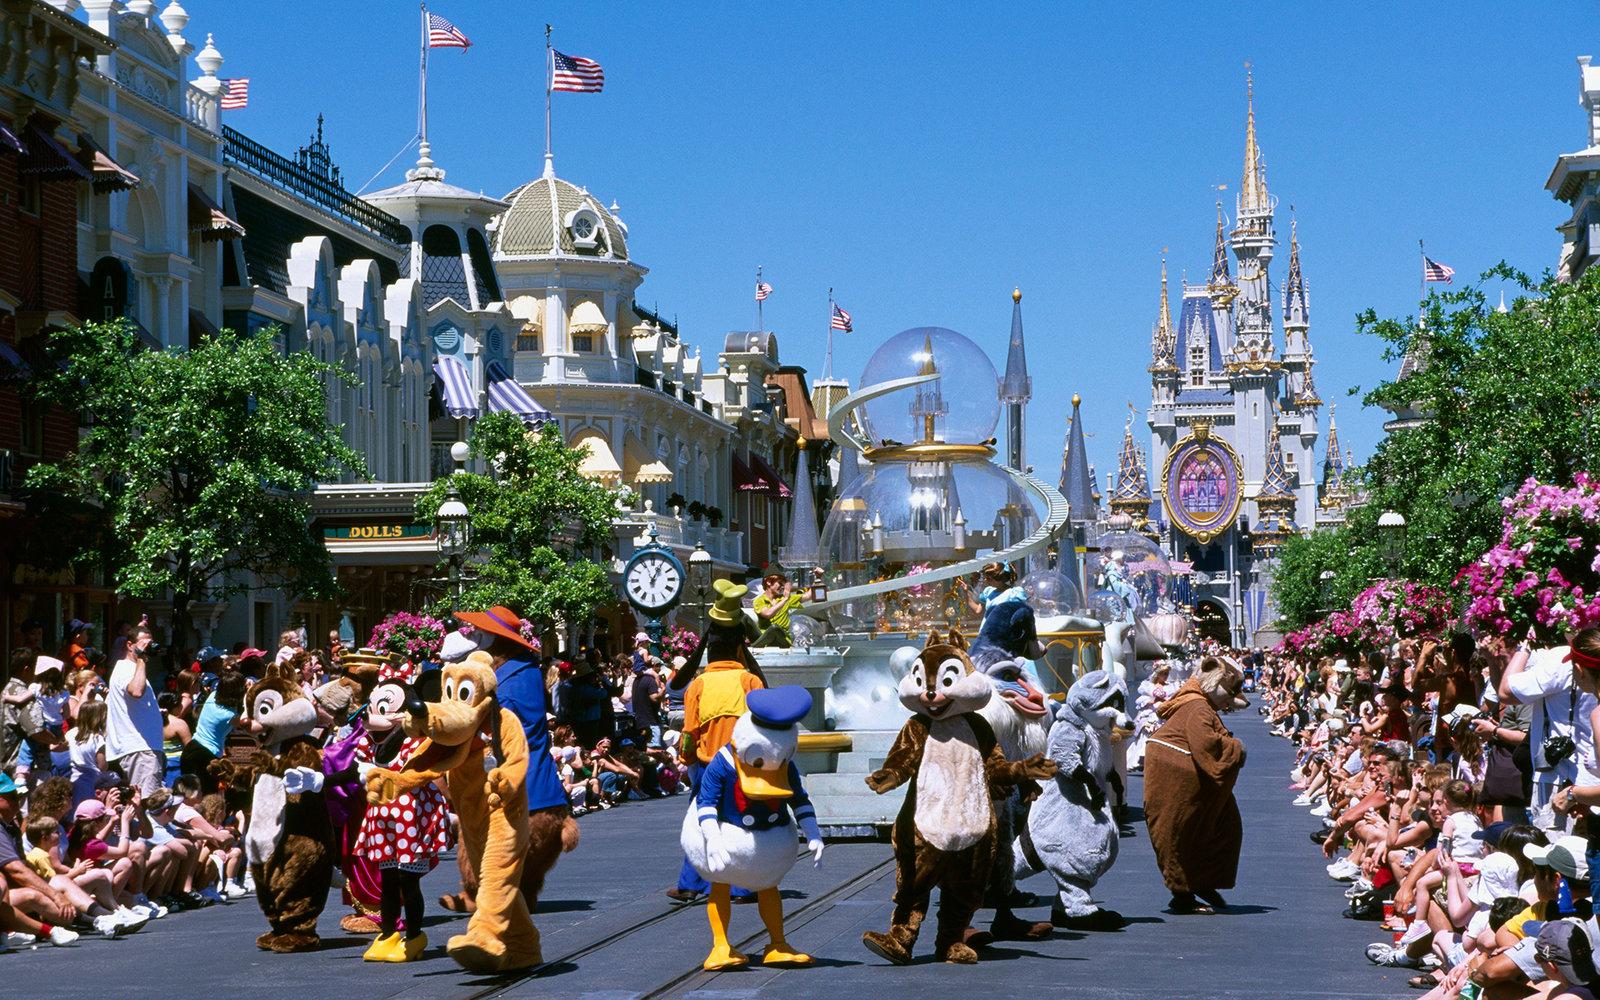 C15HER Magic Kingdom, Disneyworld, Disney World, Orlando, Florida, USA